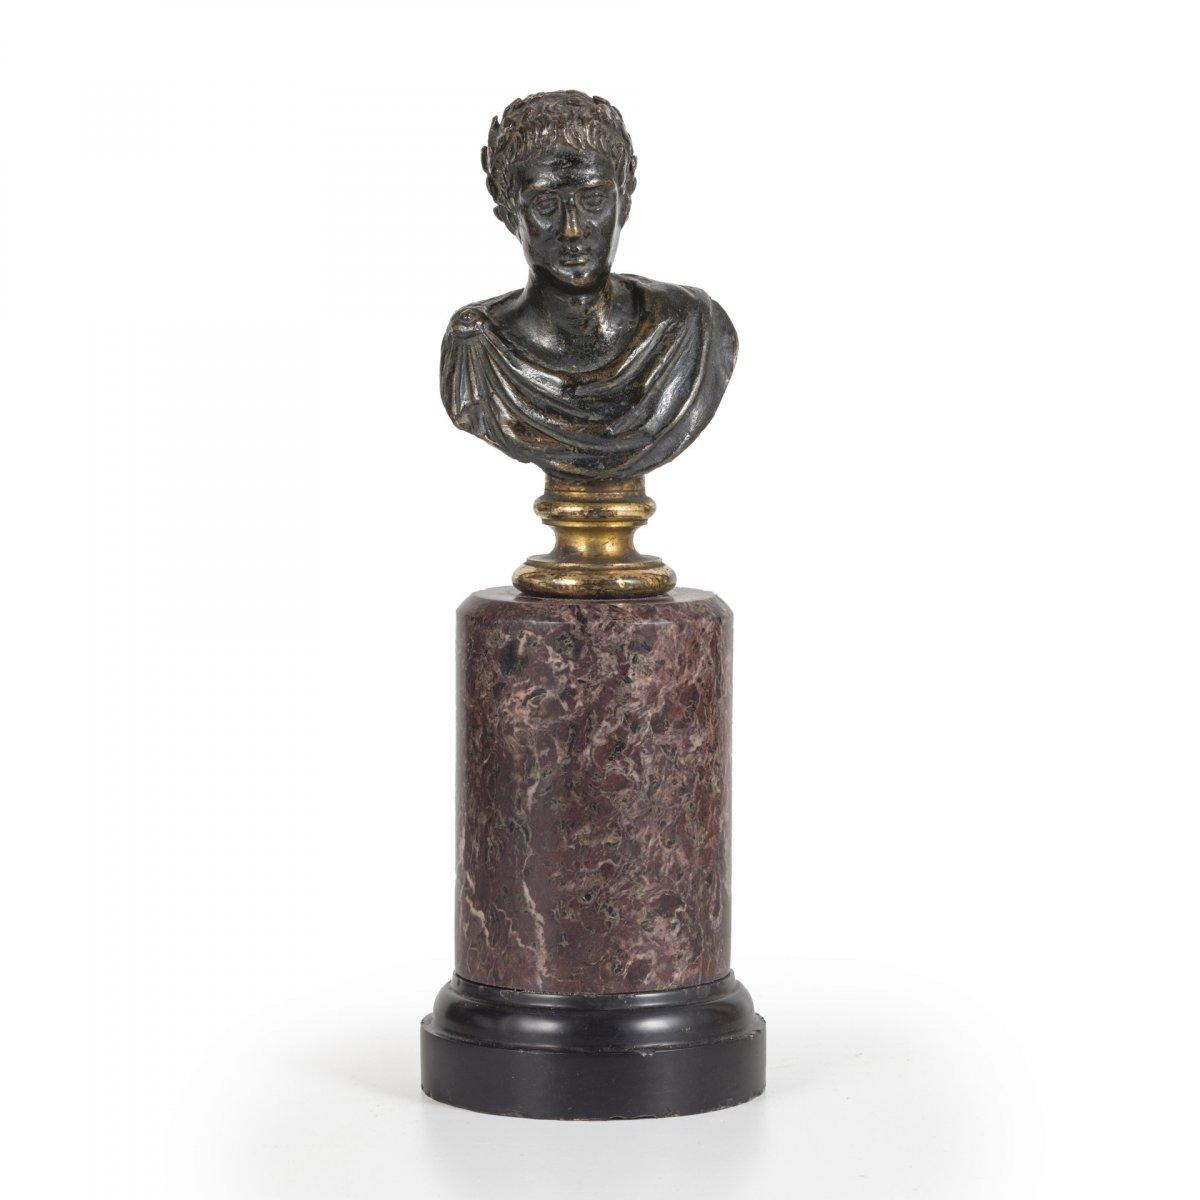 Petit Buste En Bronze De Jules Cesar, XVII Siecle